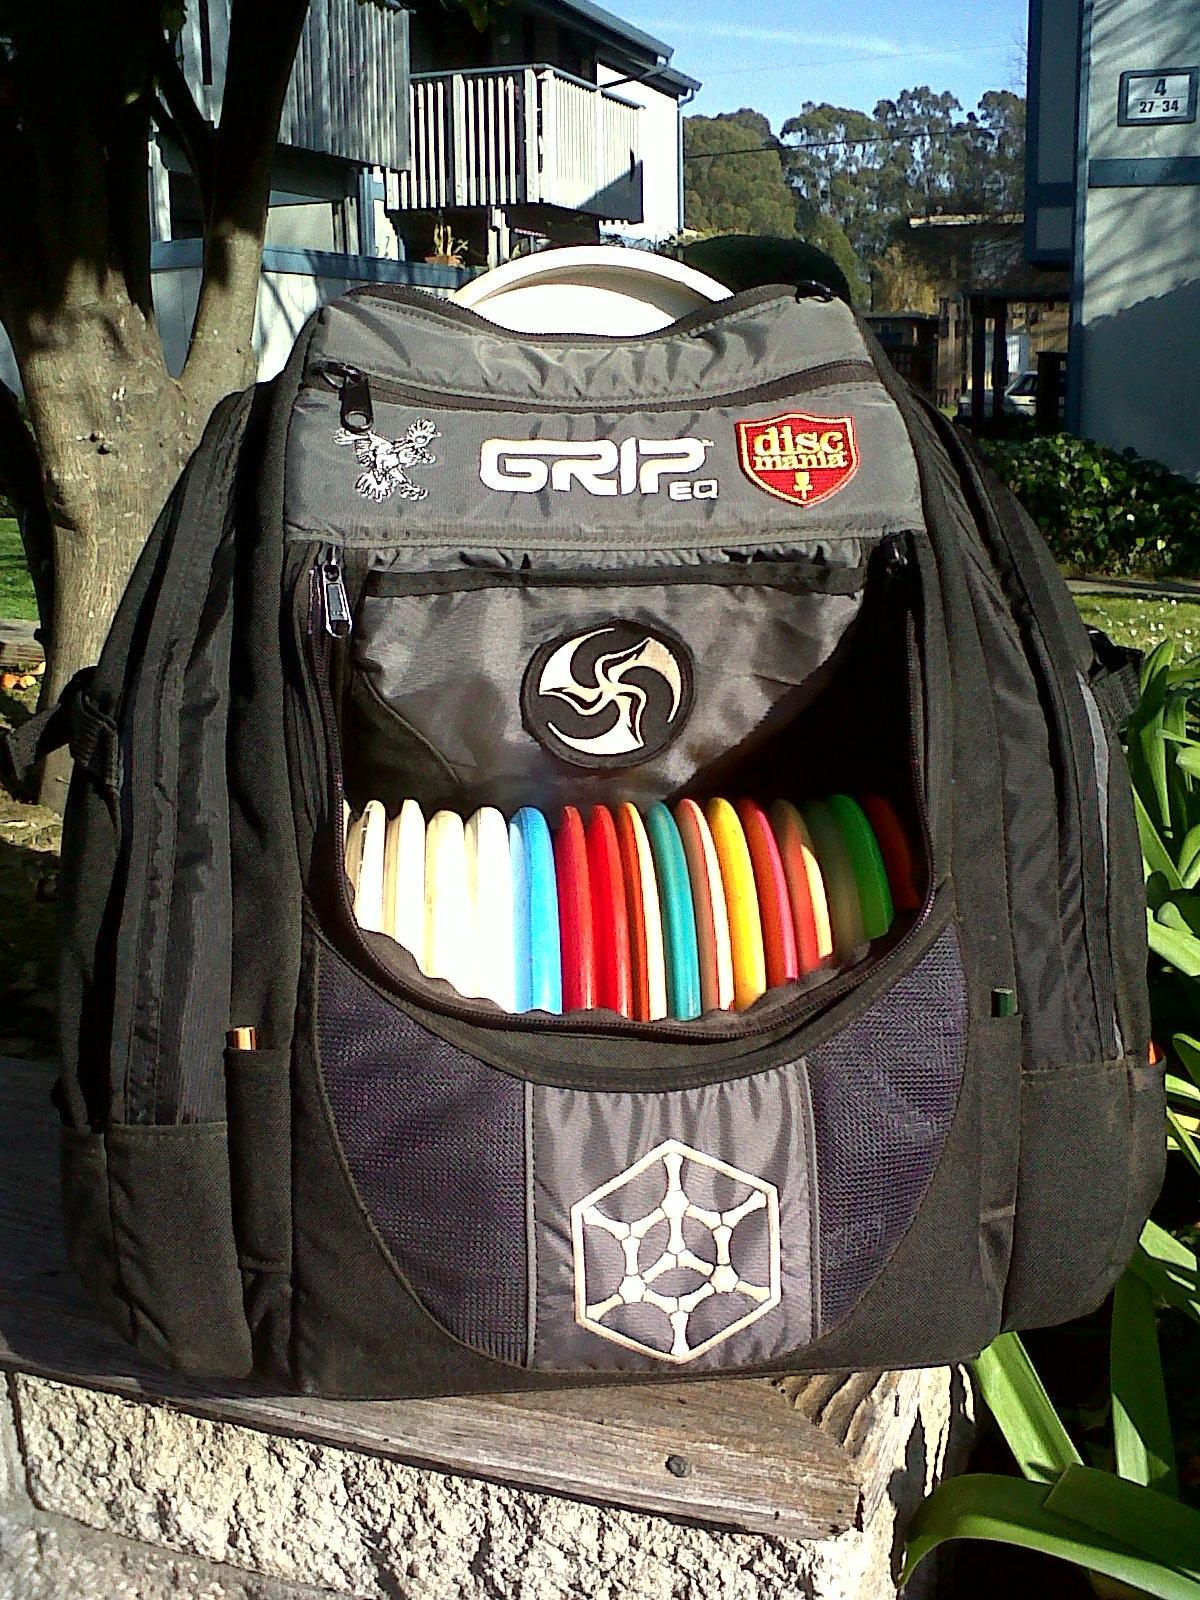 Grip Equipment Bag - eBay Auction